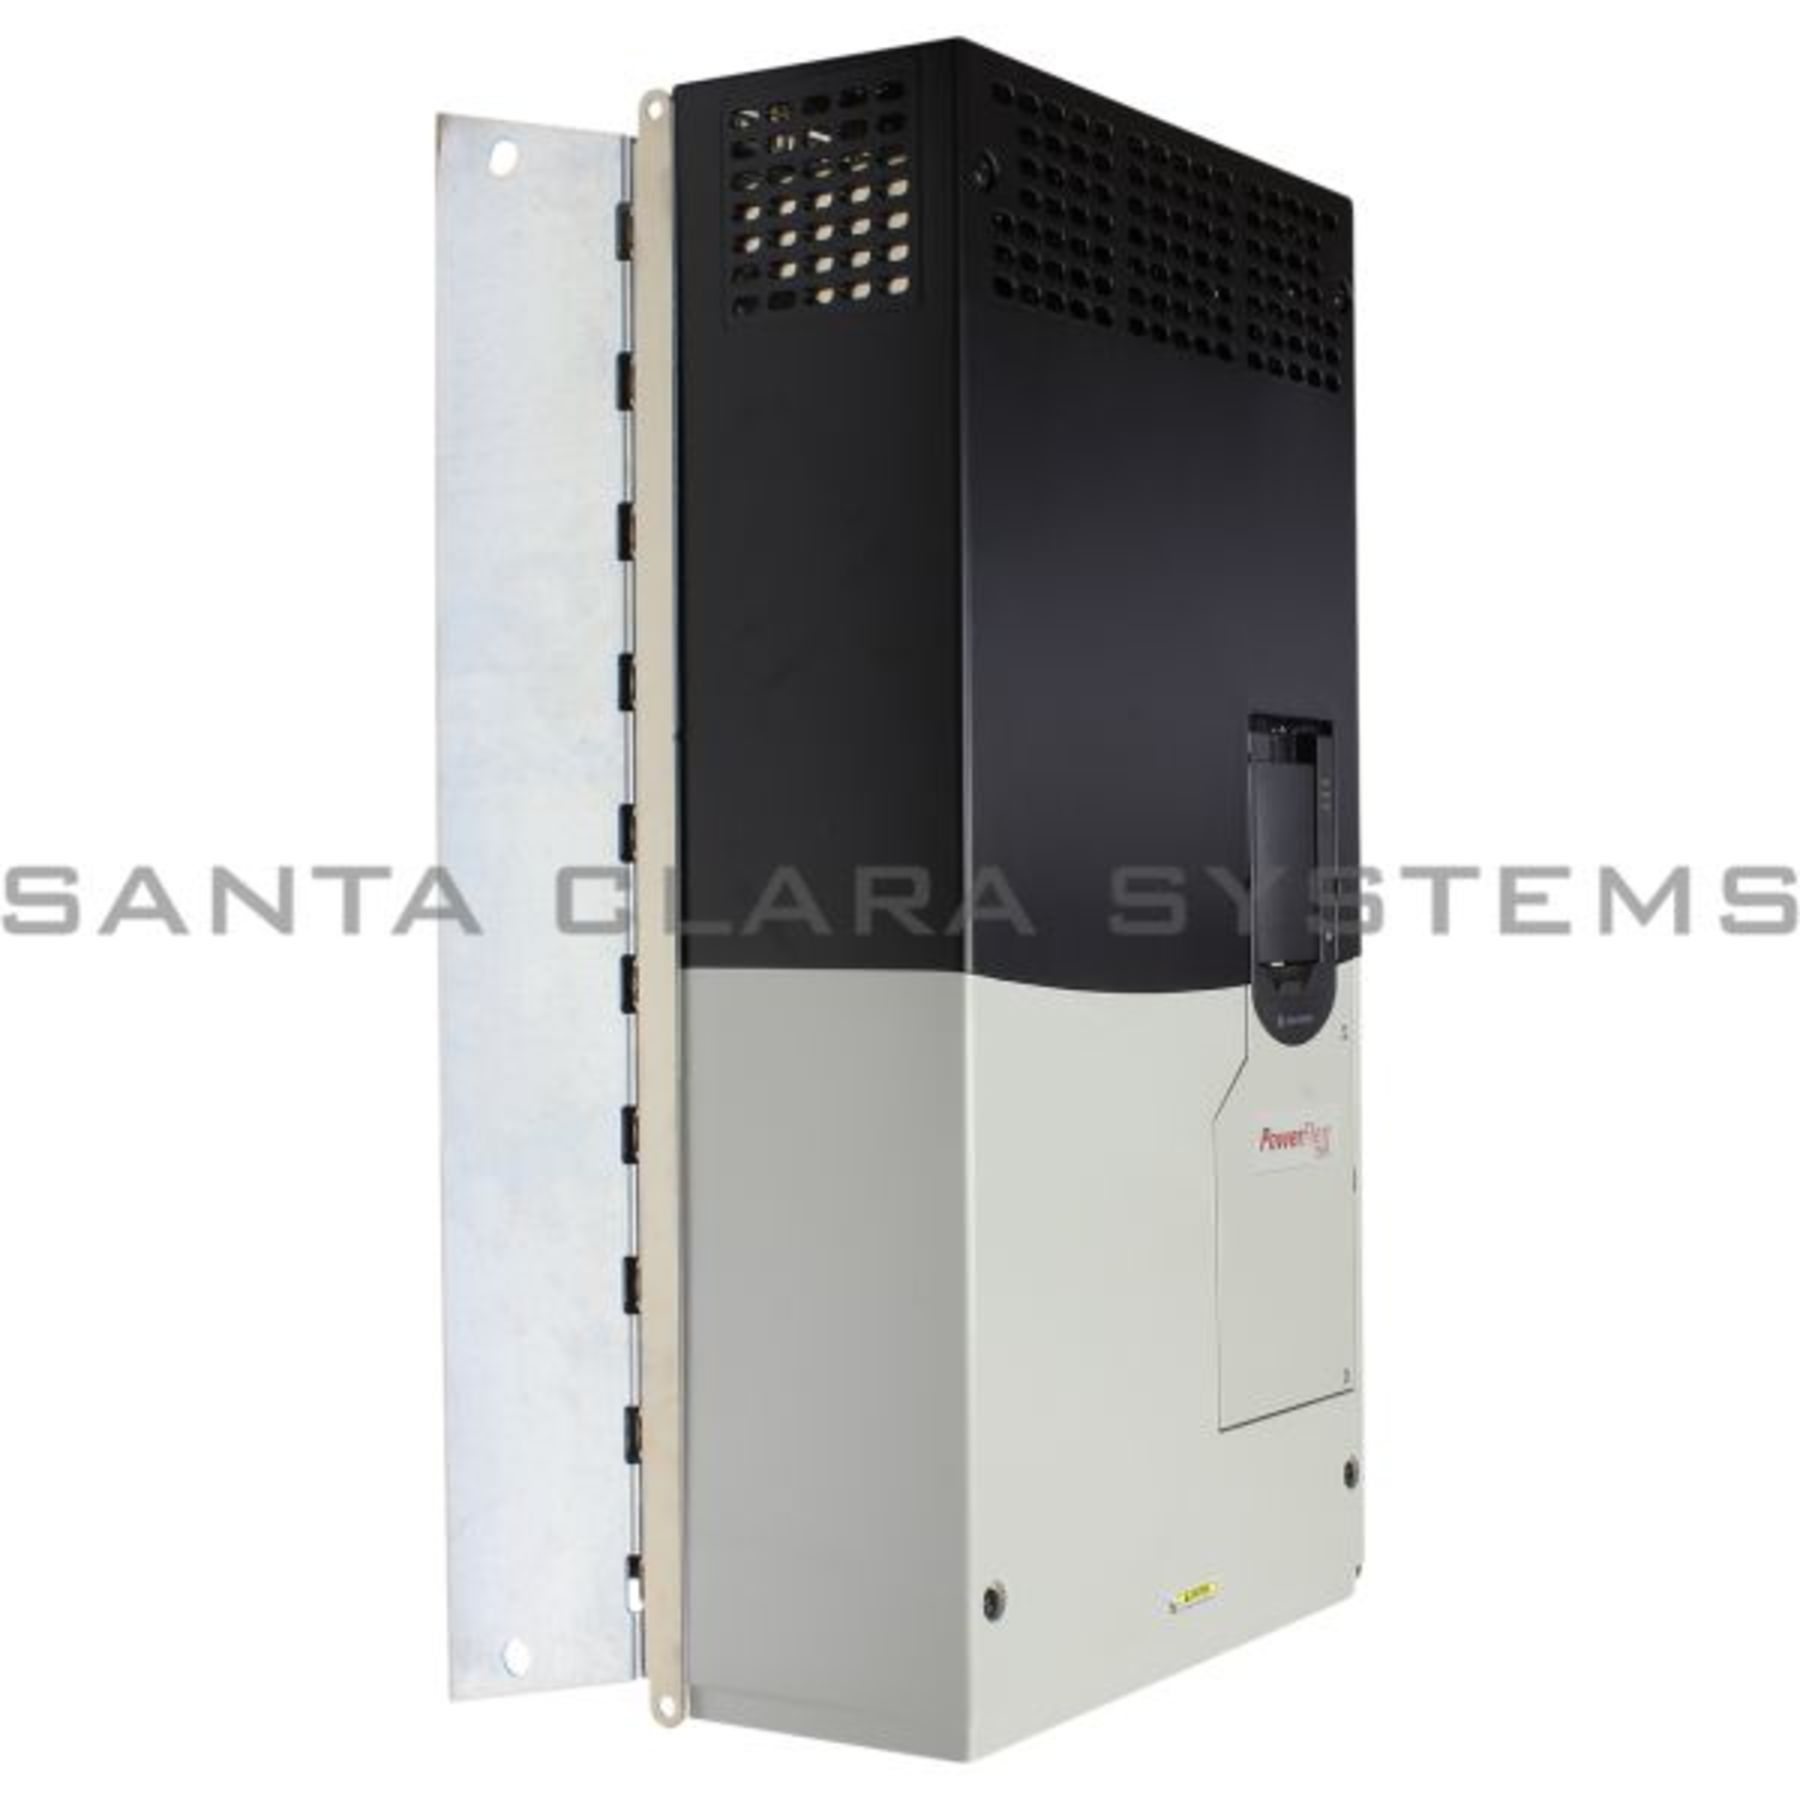 20G1AND302AA0NNNNN PowerFlex 755 AC Drive | 20G1A ND 302 AA0NNNNN In